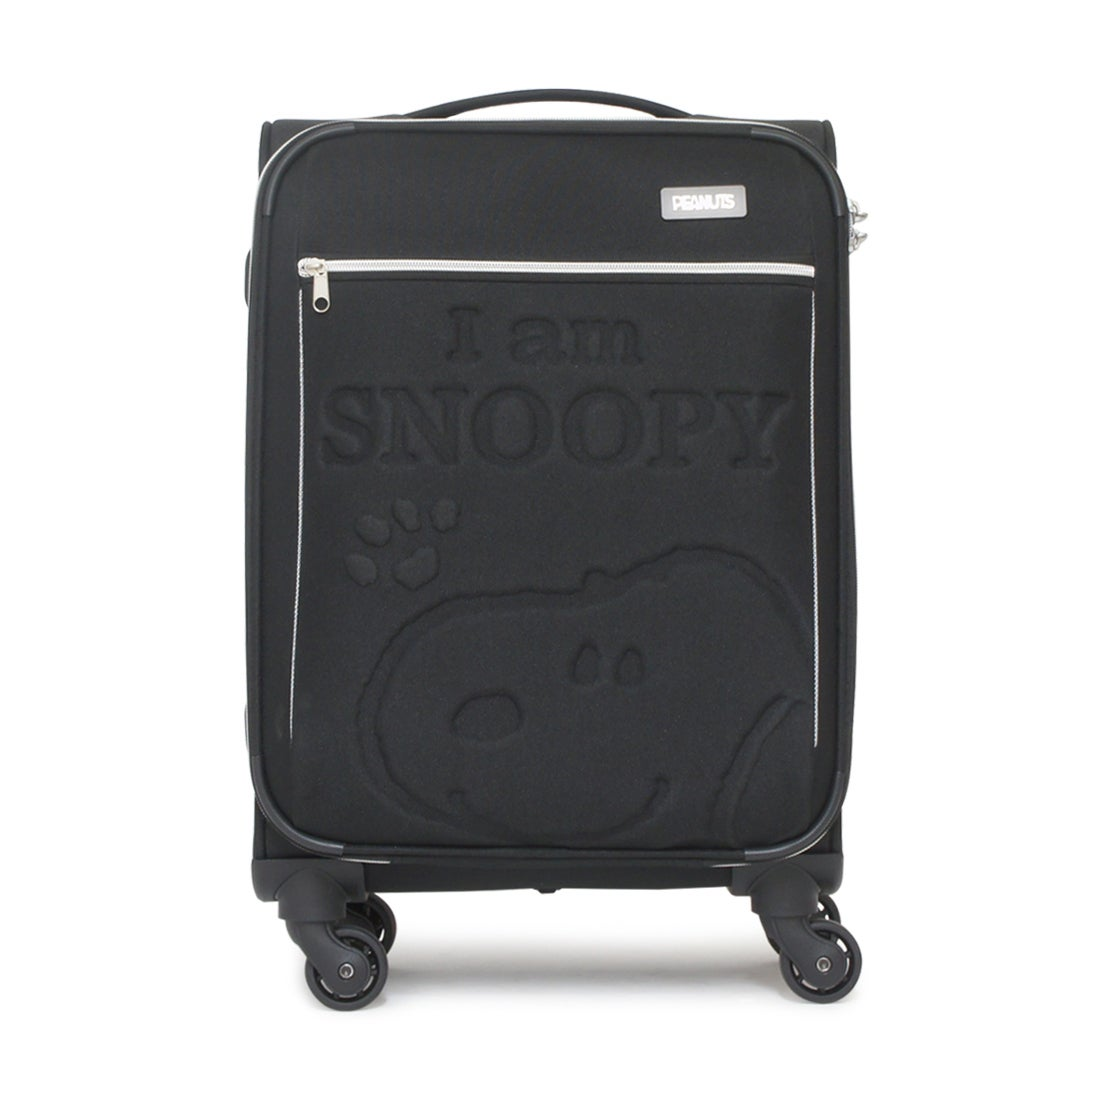 【SAC'S BAR】スヌーピー SNOOPY ソフトキャリーケース PN-005 46cm BLACK レディース